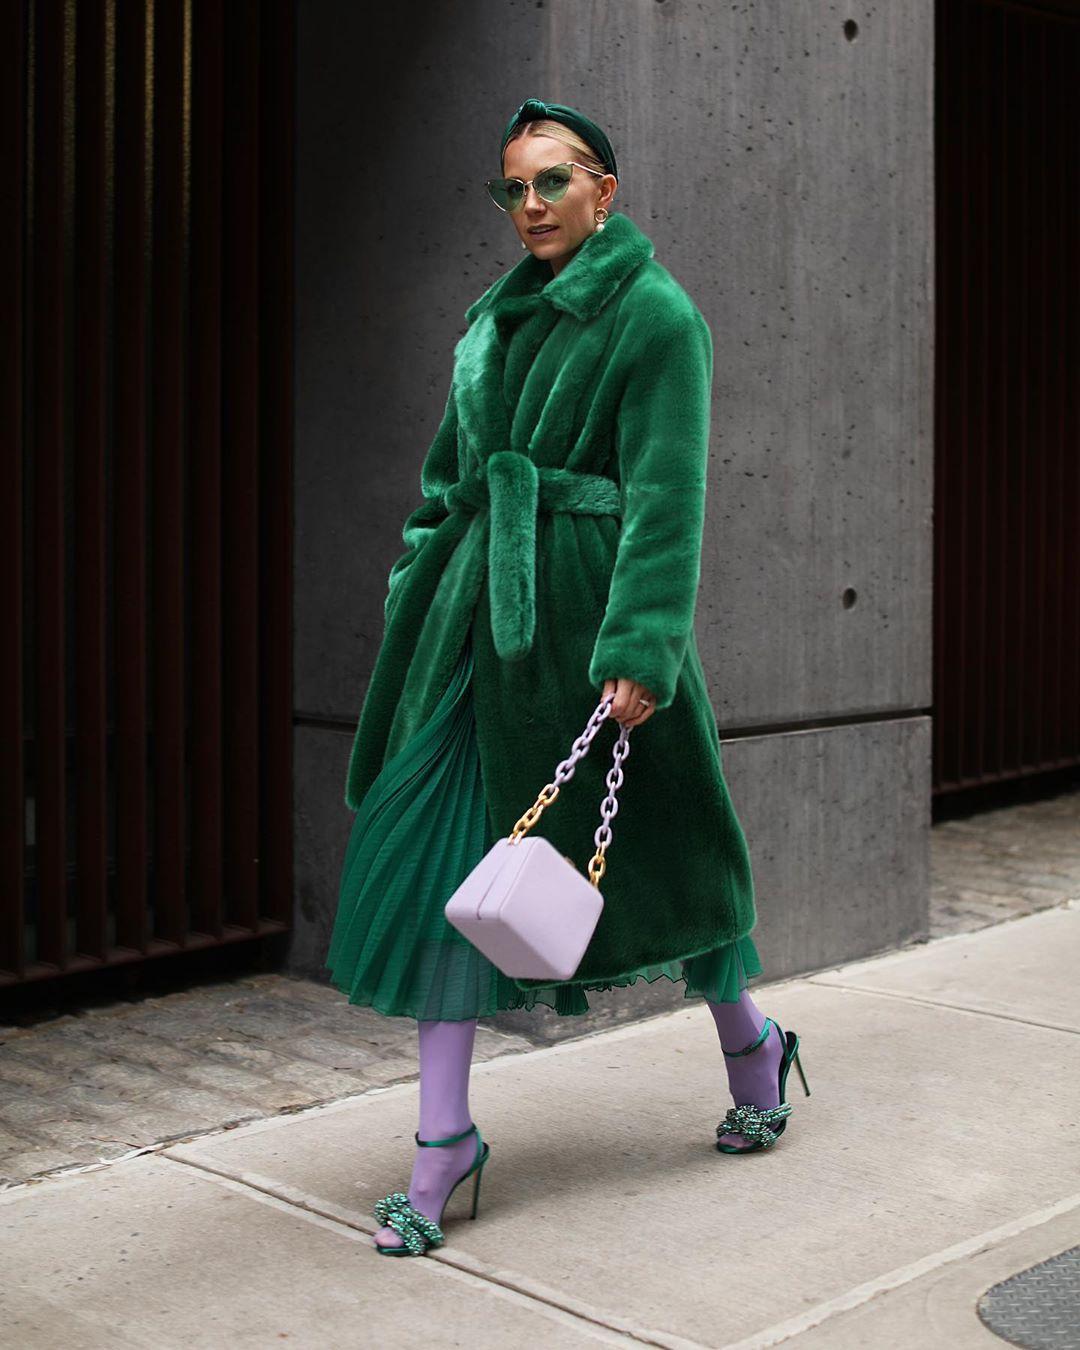 coat faux fur coat green coat oversized cardigan shoulder bag boxed bag tights sandals green skirt pleated skirt midi skirt headband